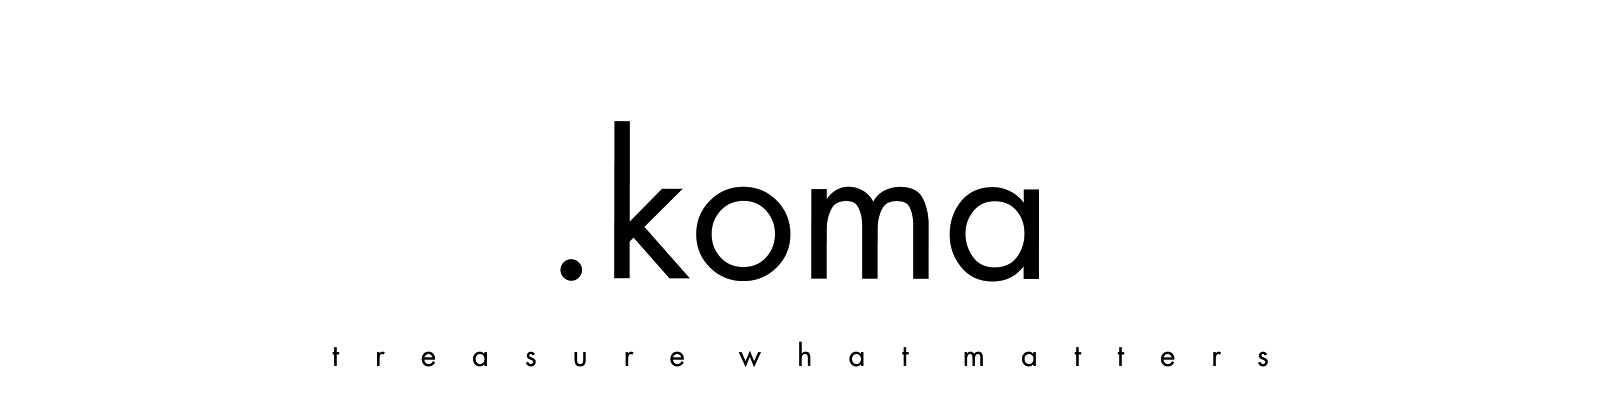 Titik Koma